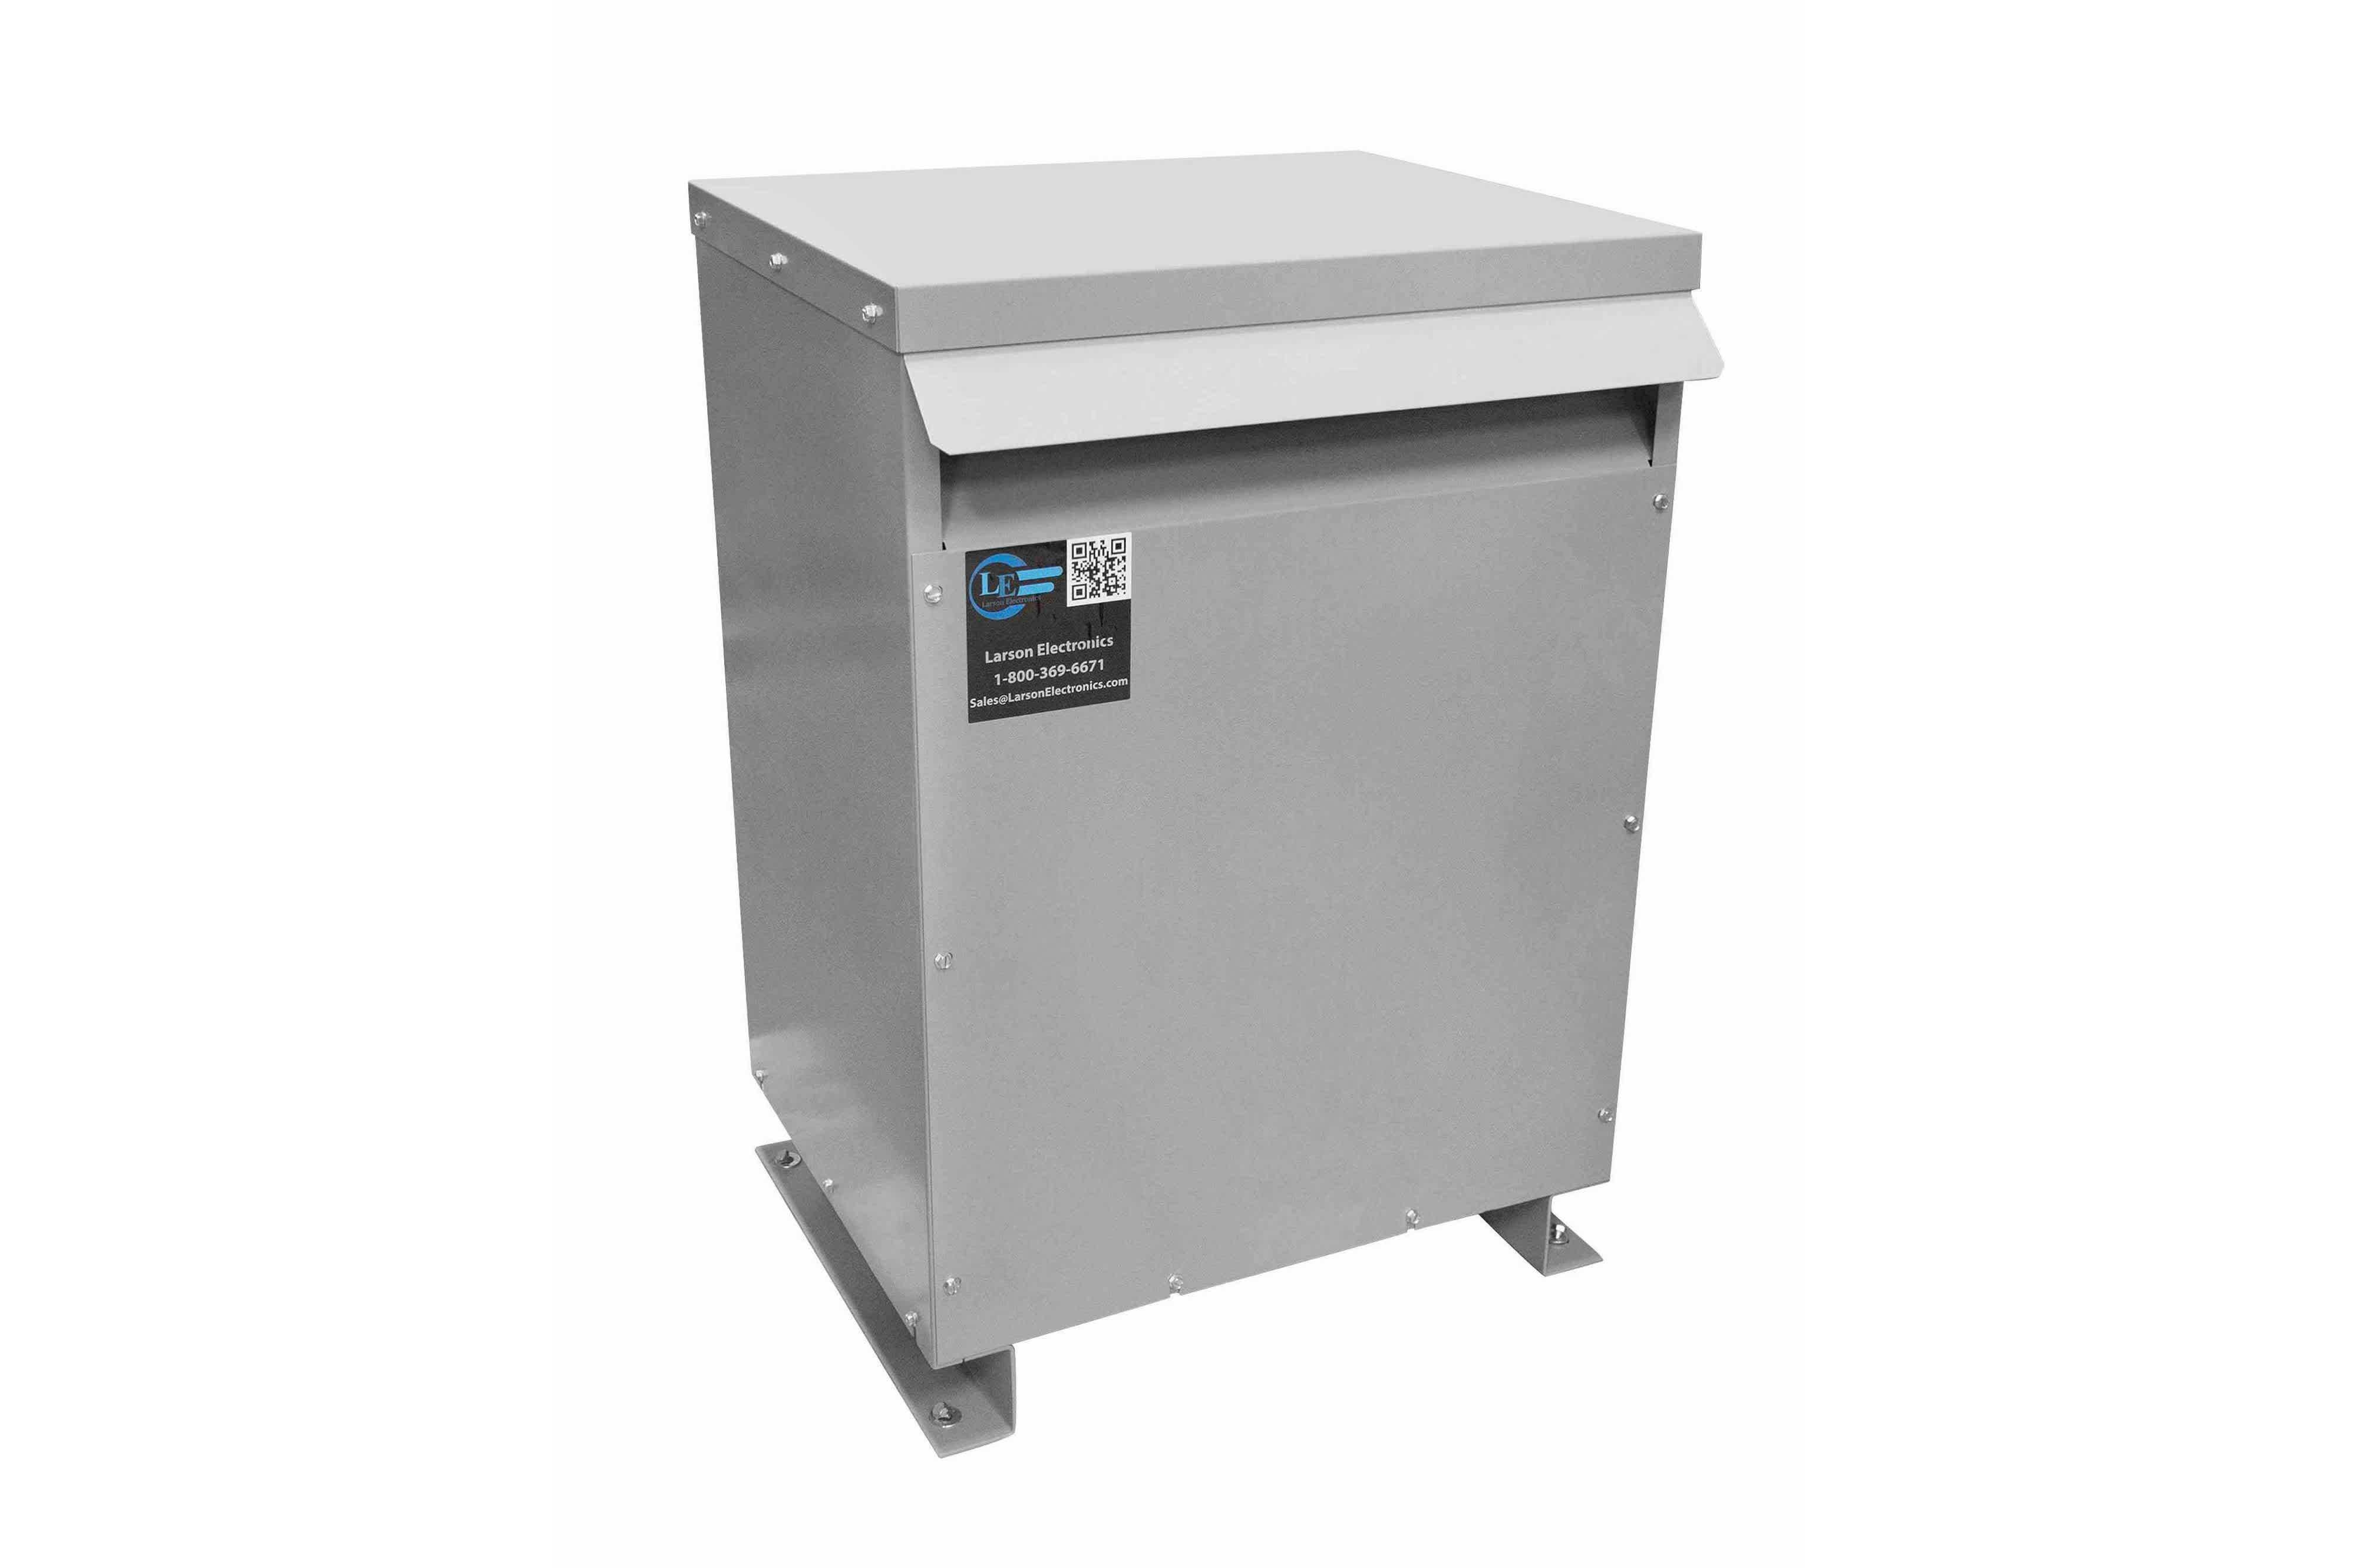 35 kVA 3PH Isolation Transformer, 400V Wye Primary, 240V/120 Delta Secondary, N3R, Ventilated, 60 Hz